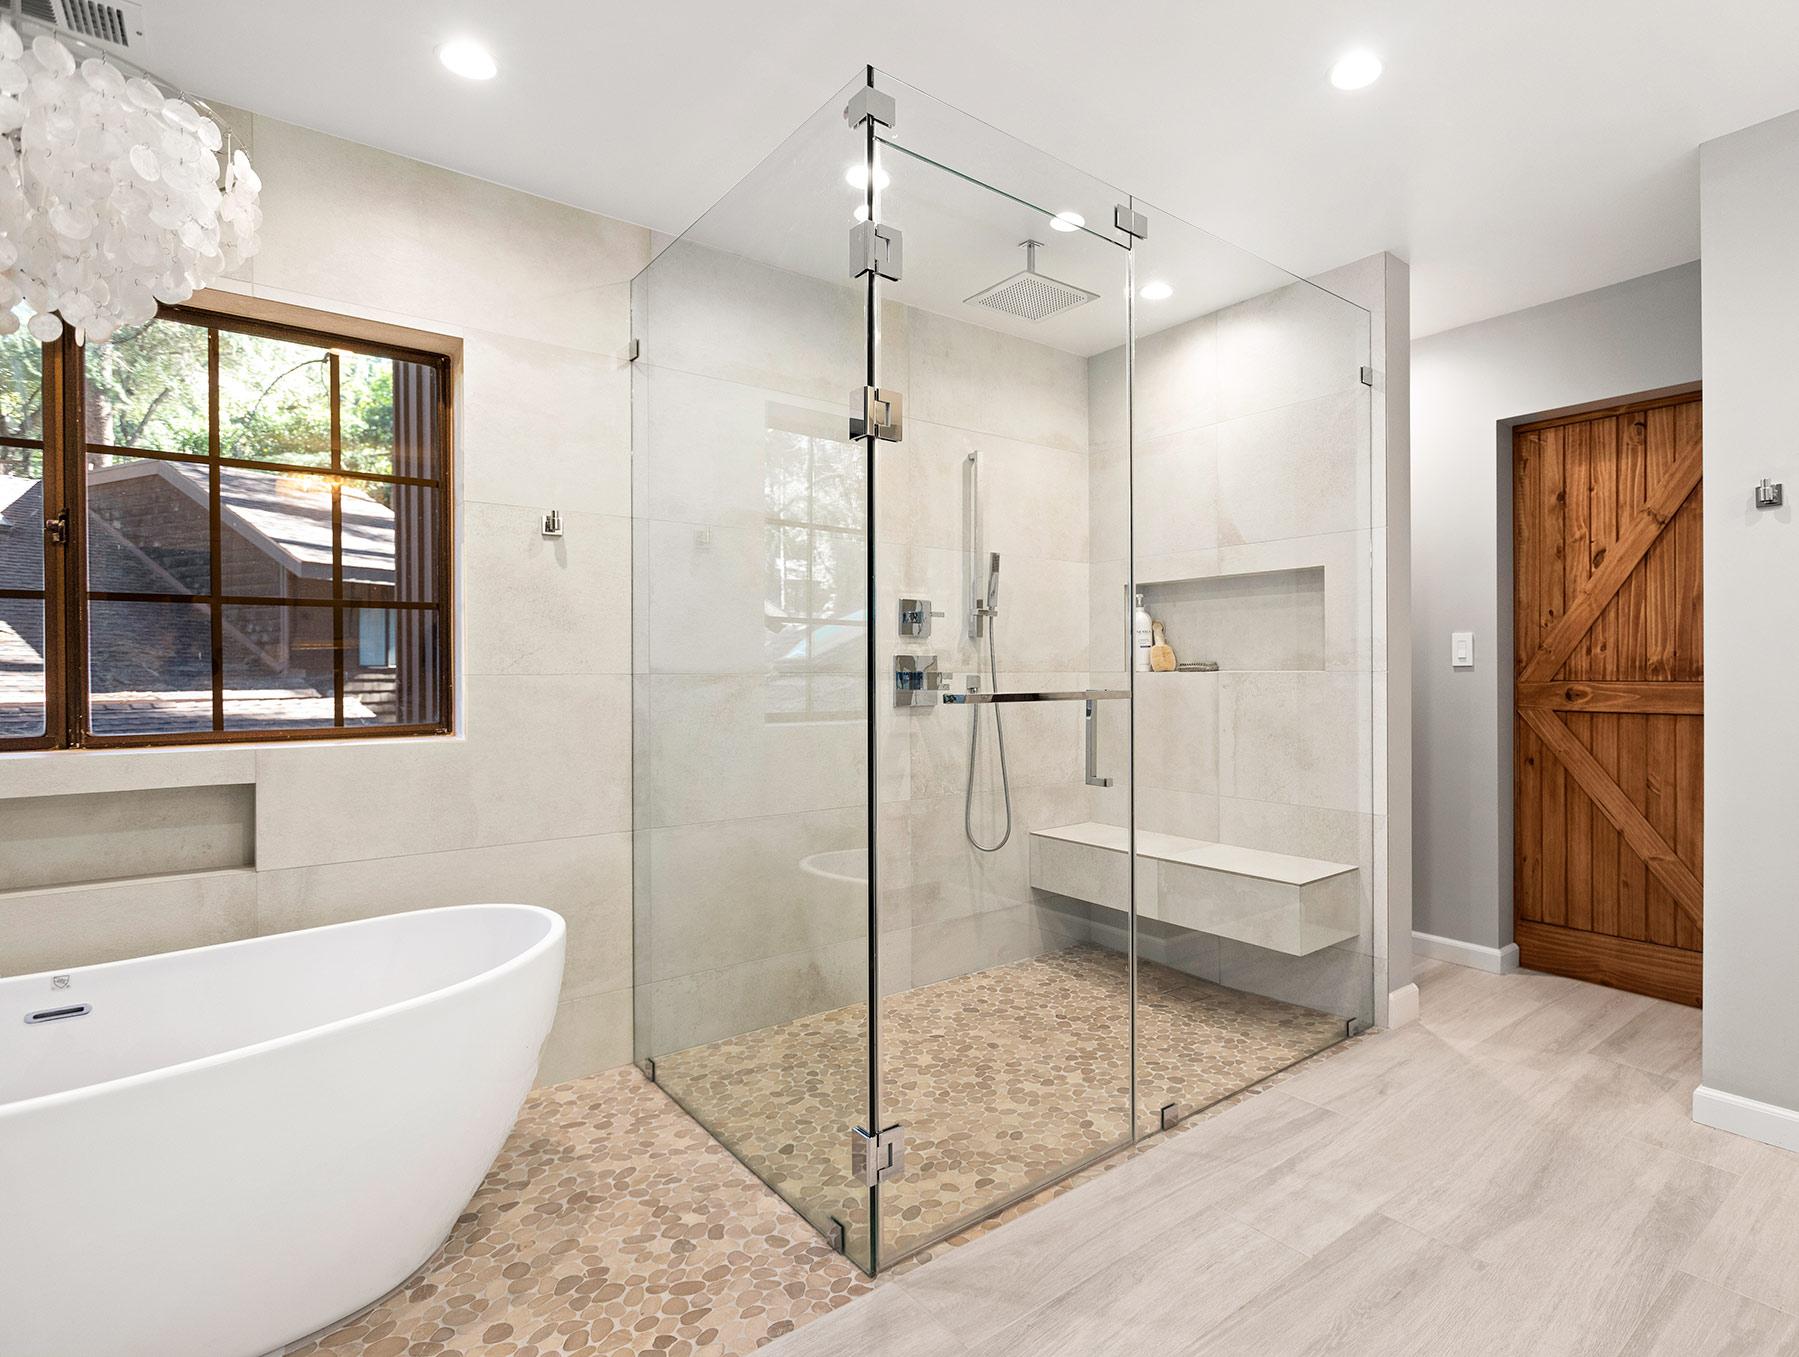 LA Canada complete remodel bathroom 1 SMALL.jpg